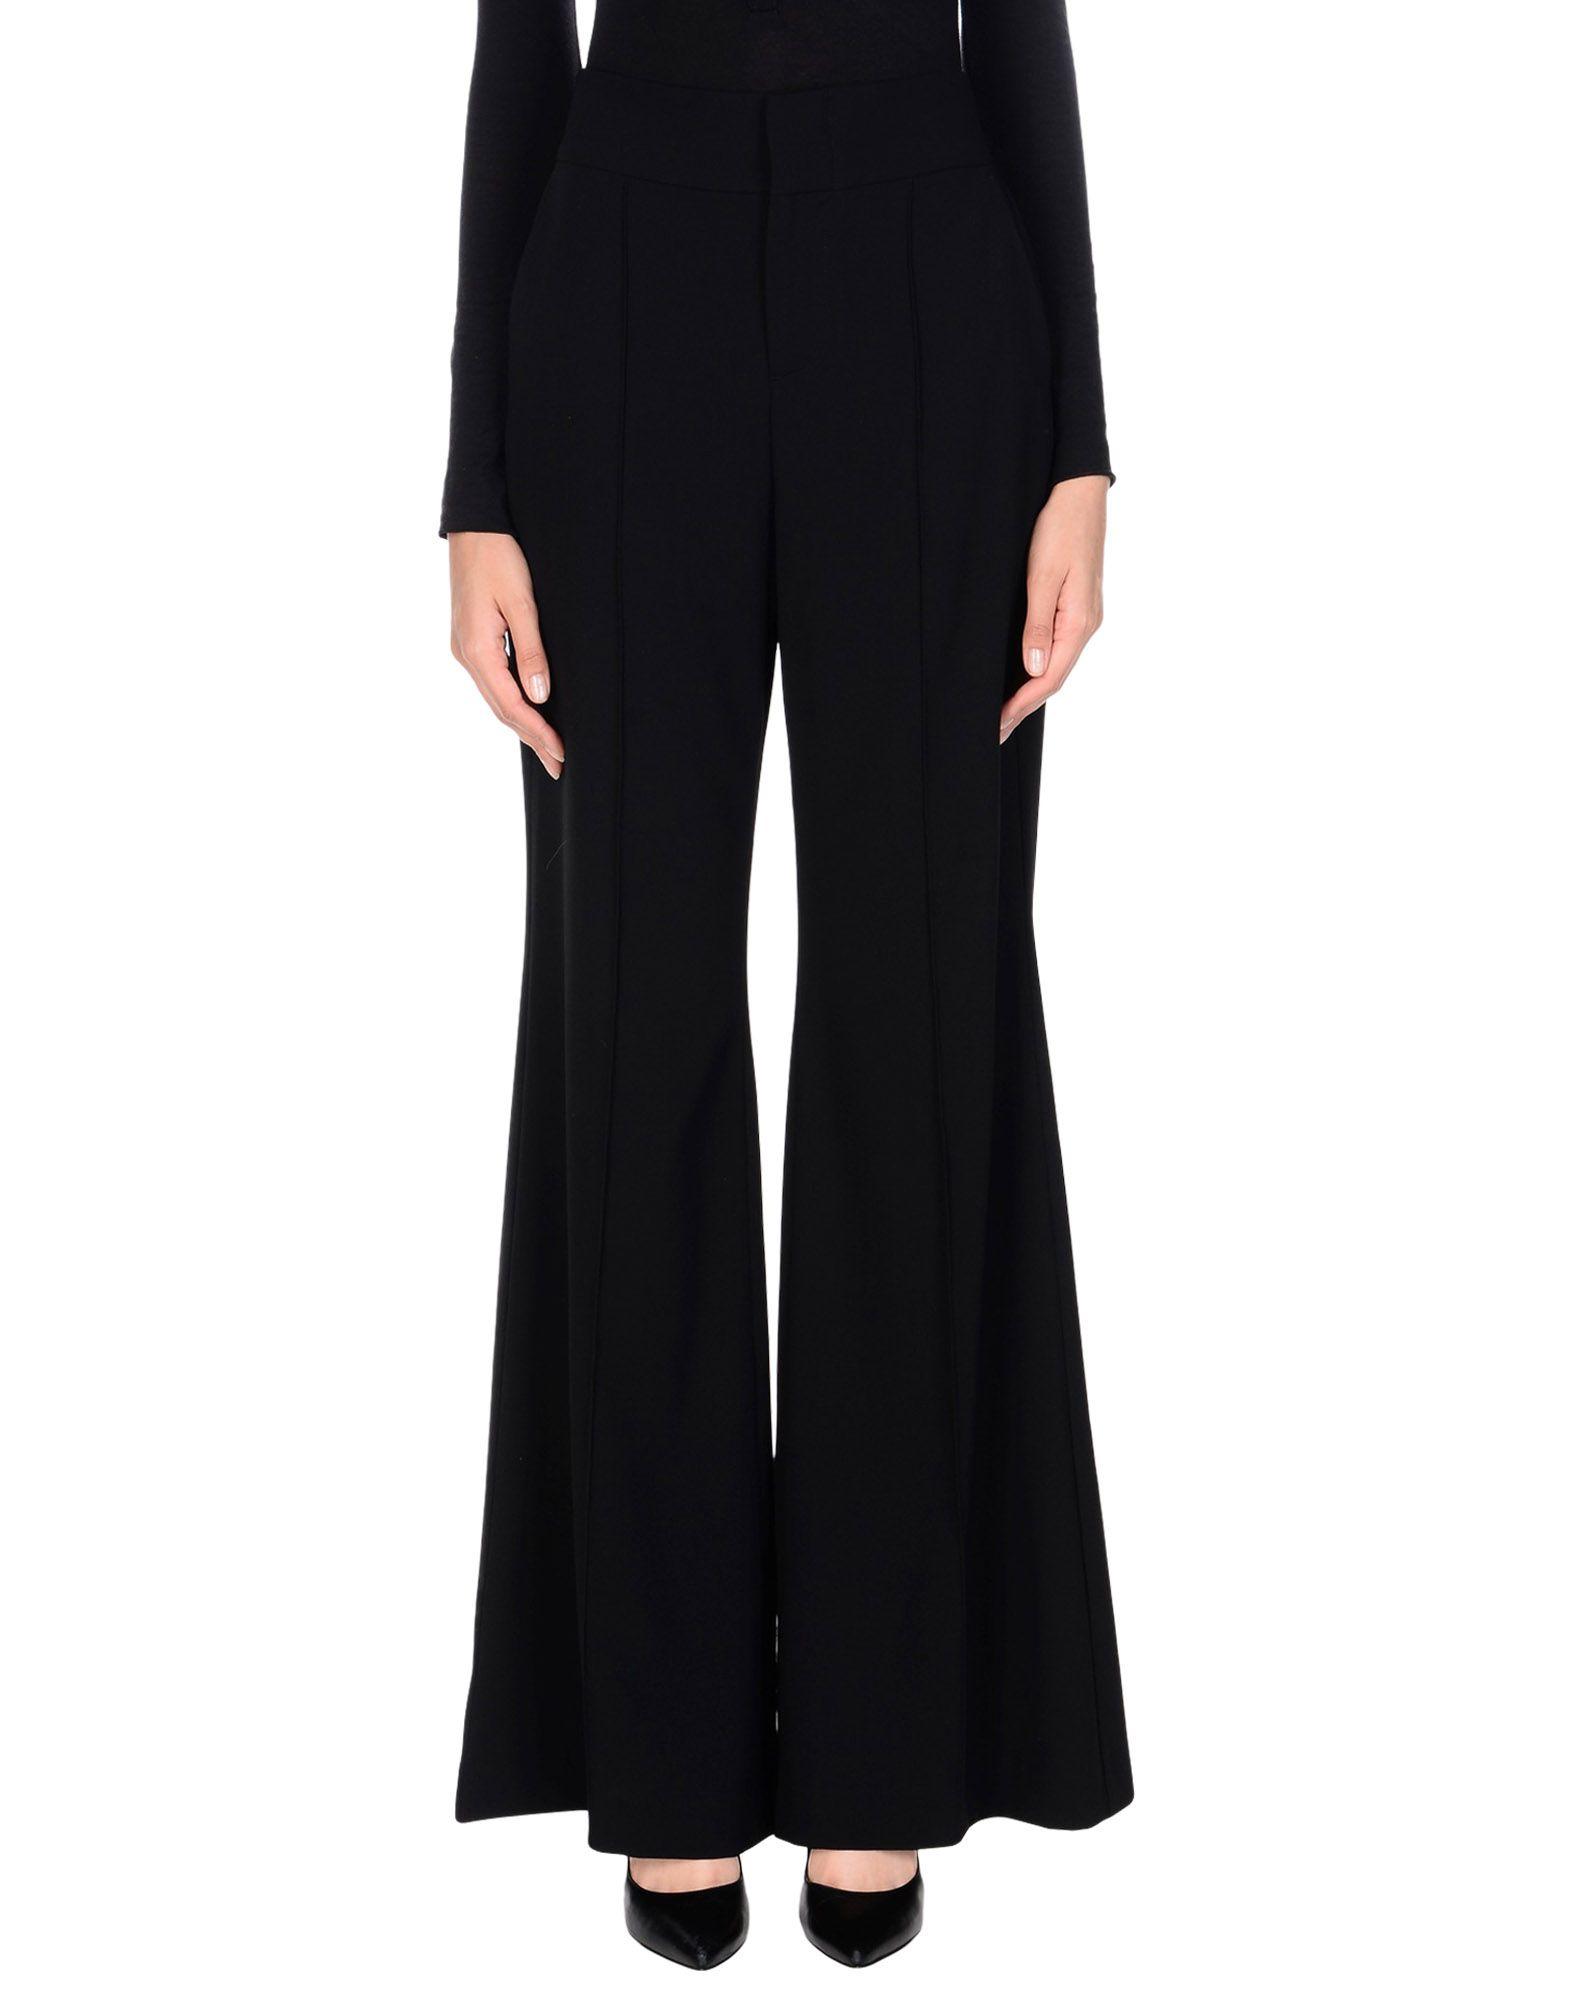 Pantalone Pantalone Pantalone Alice + Olivia donna - 13195144DB ade